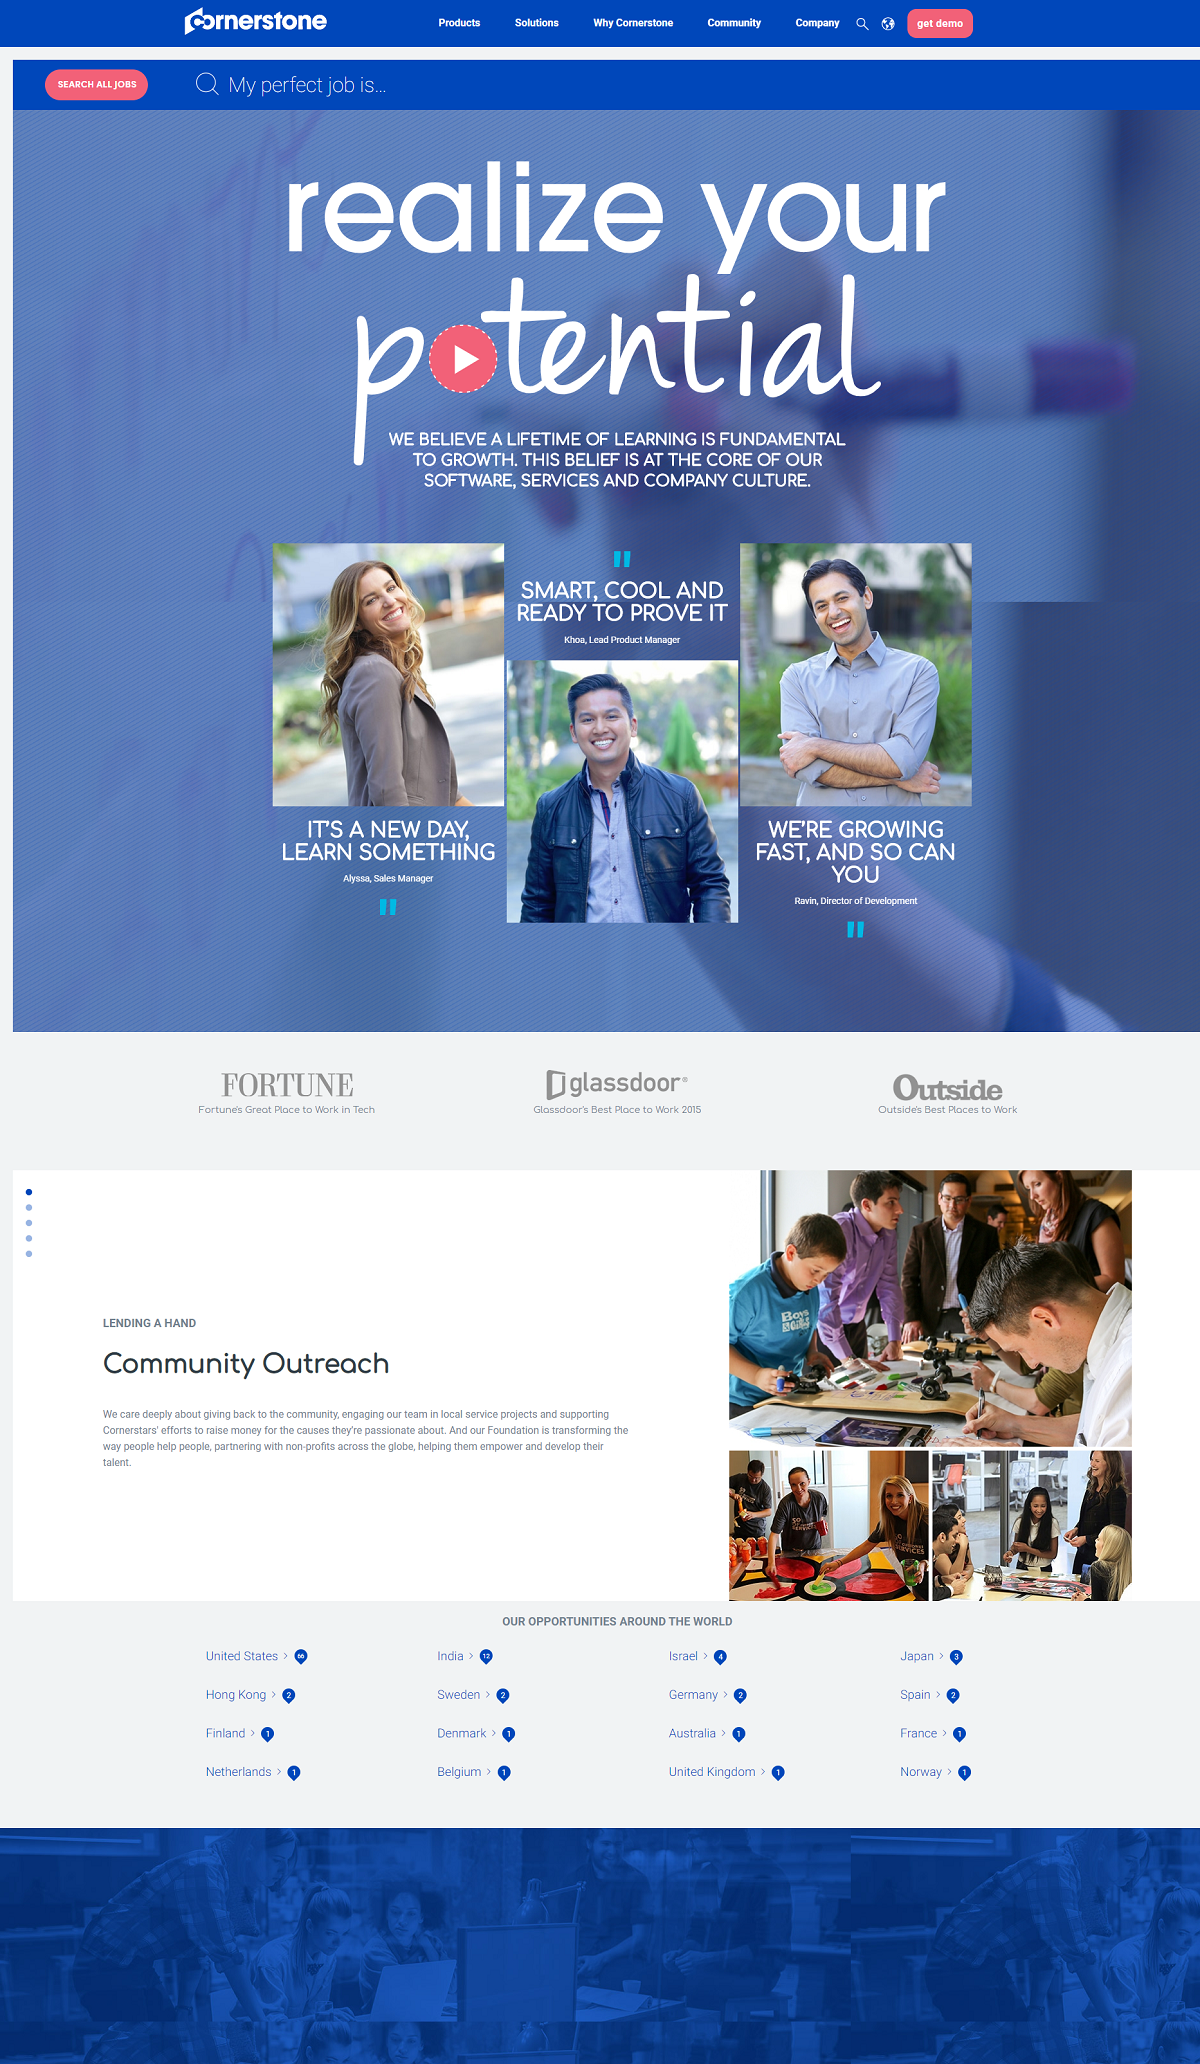 Cornerstone OnDemand careers page